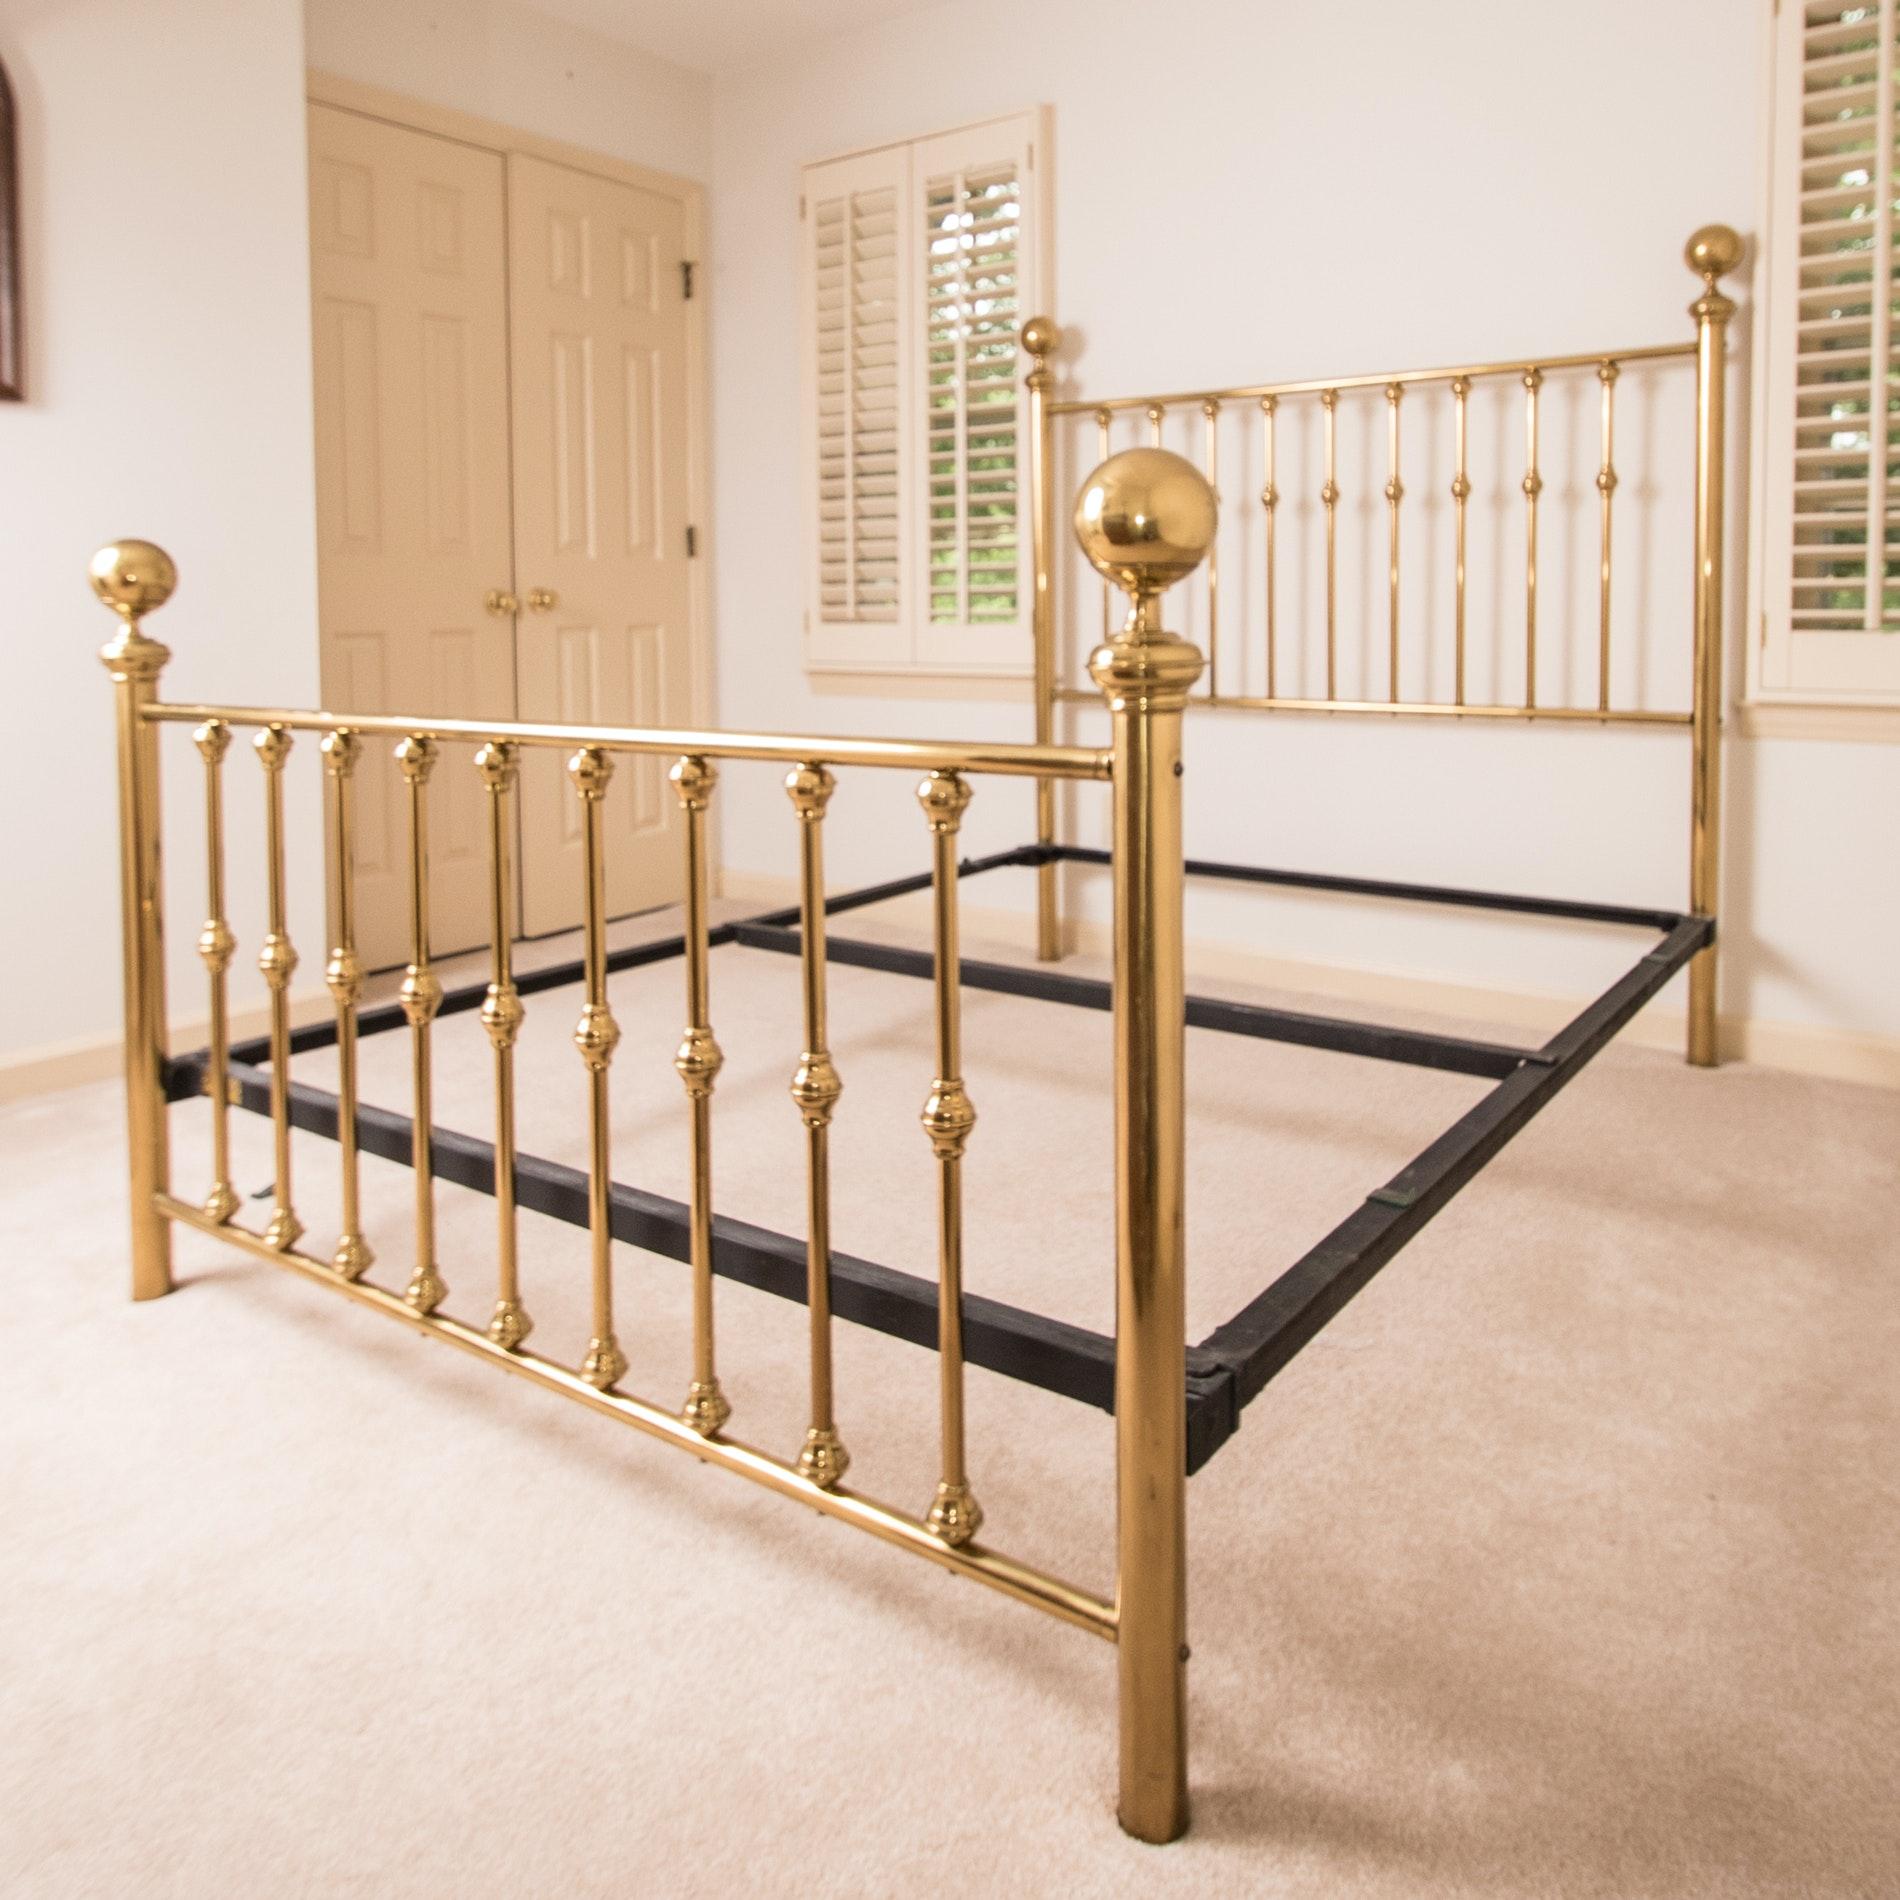 Vintage Queen Size Brass Bed Frame